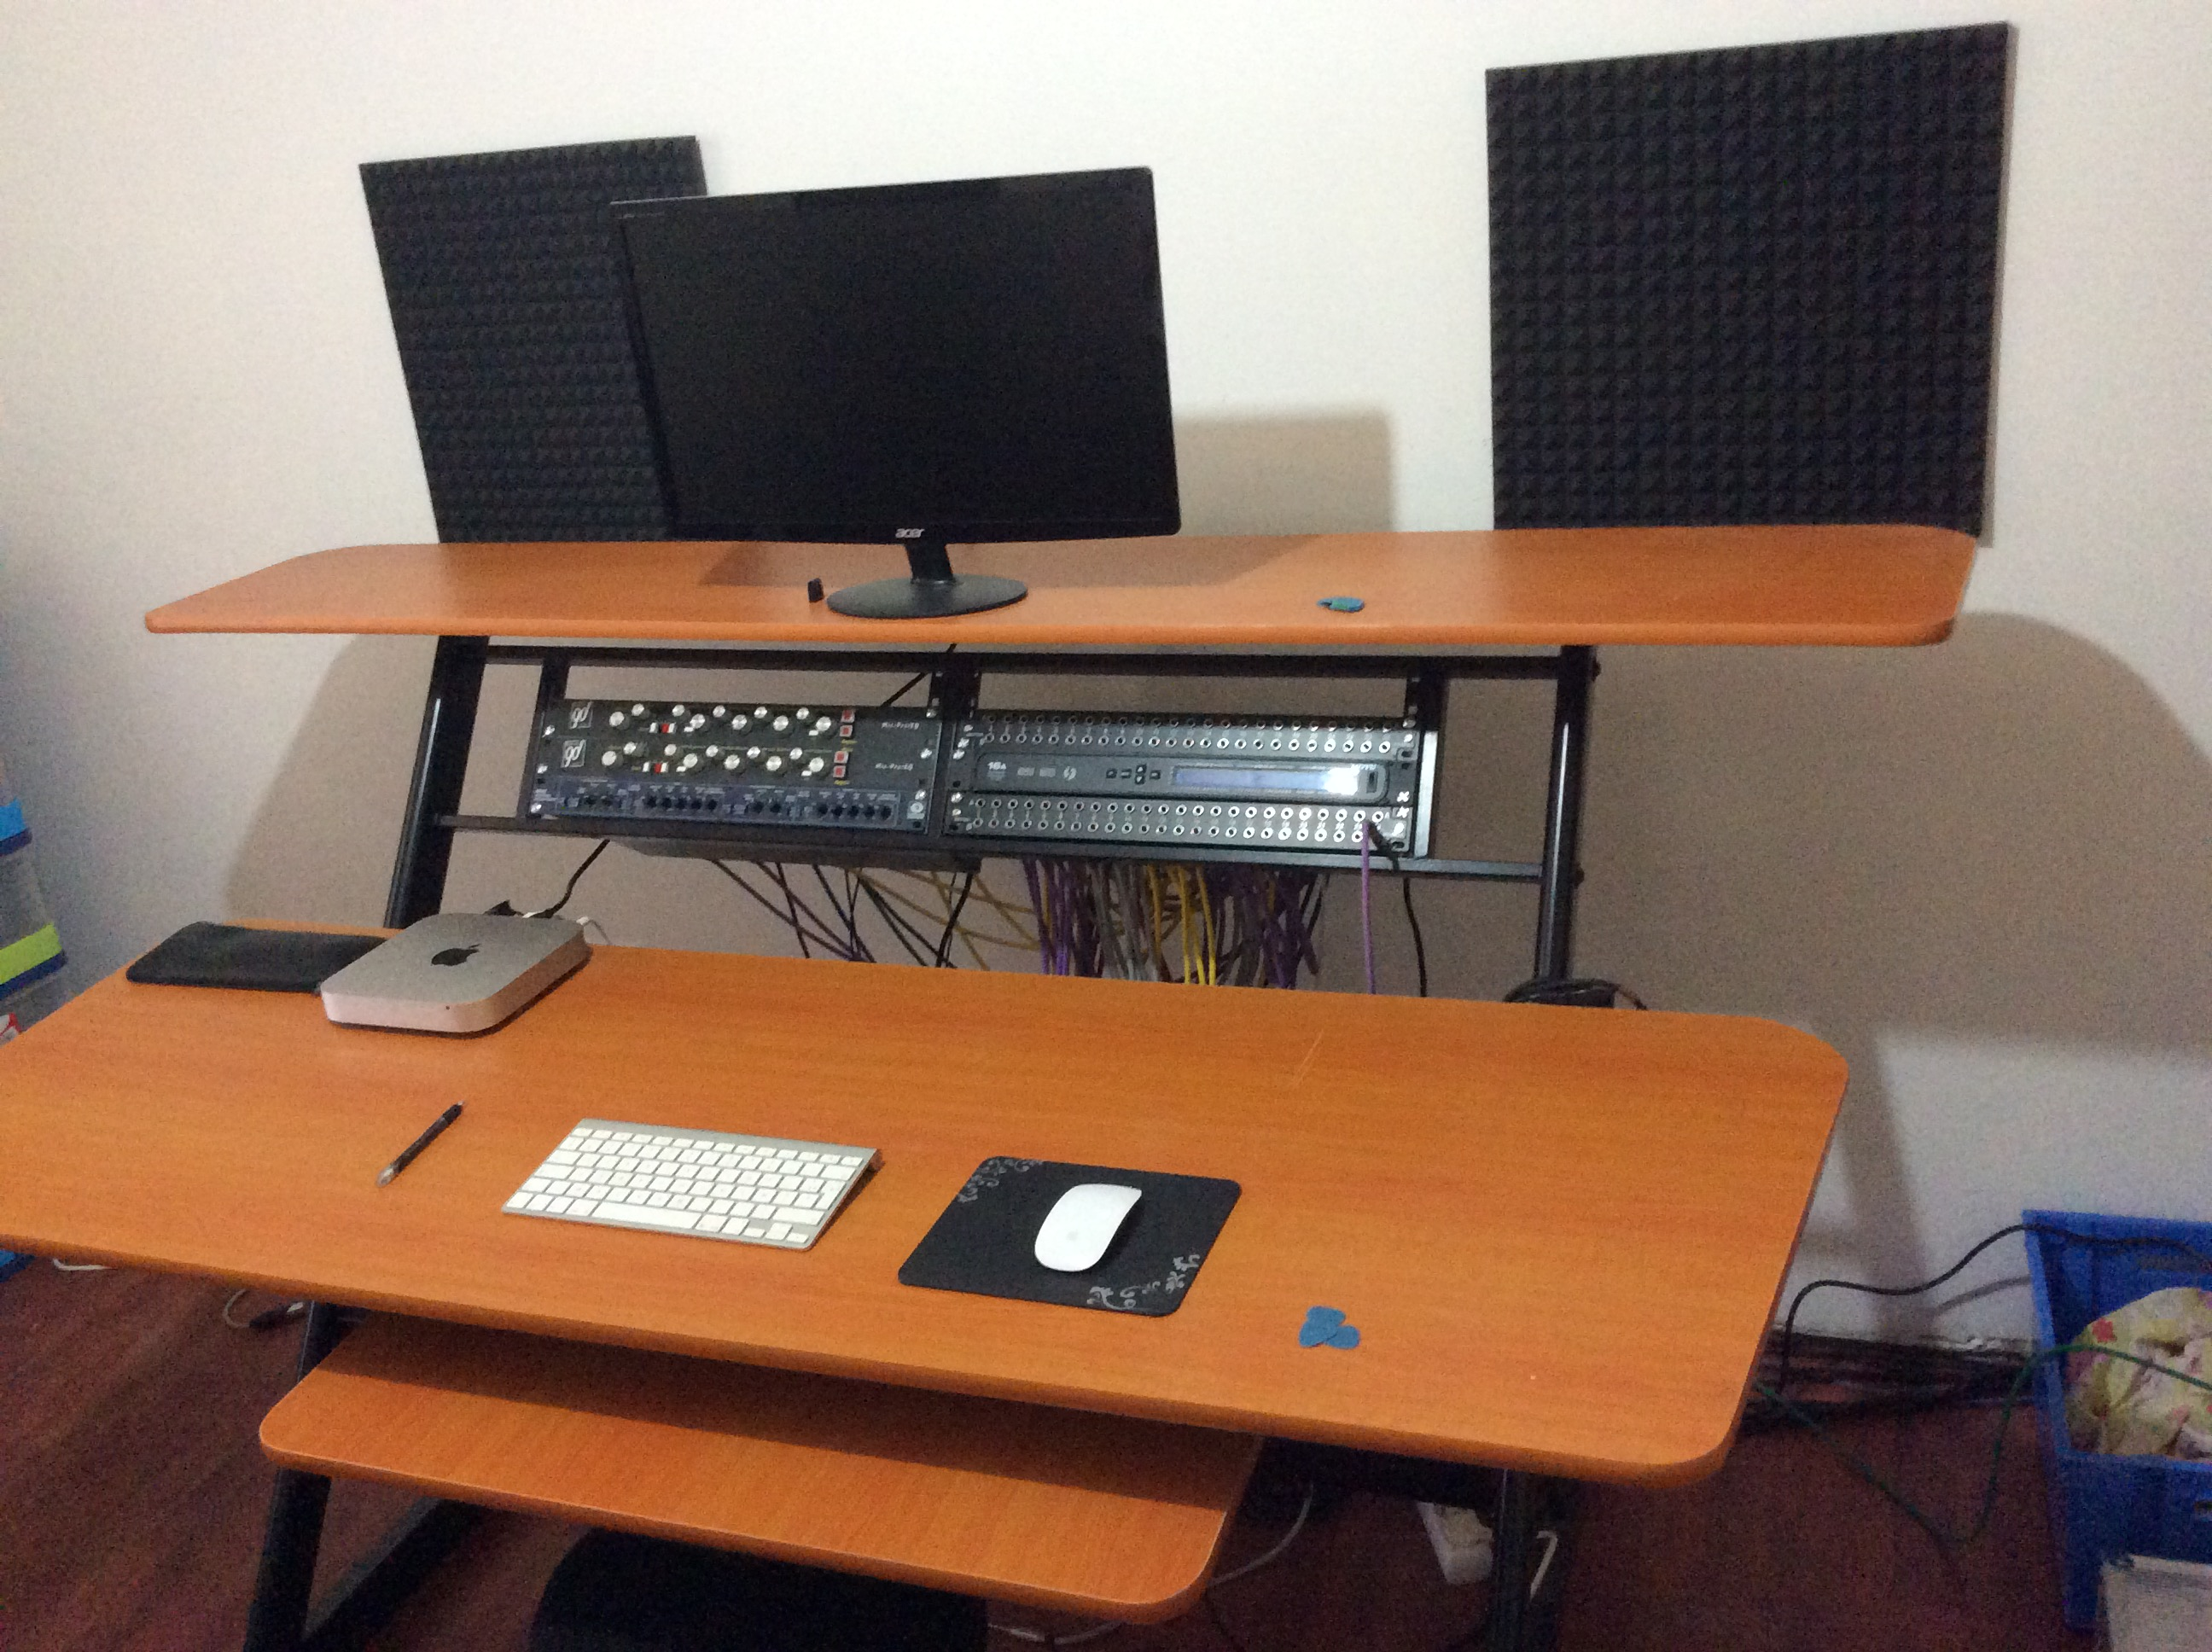 bureau studio no name meuble rack bureau studio image. Black Bedroom Furniture Sets. Home Design Ideas